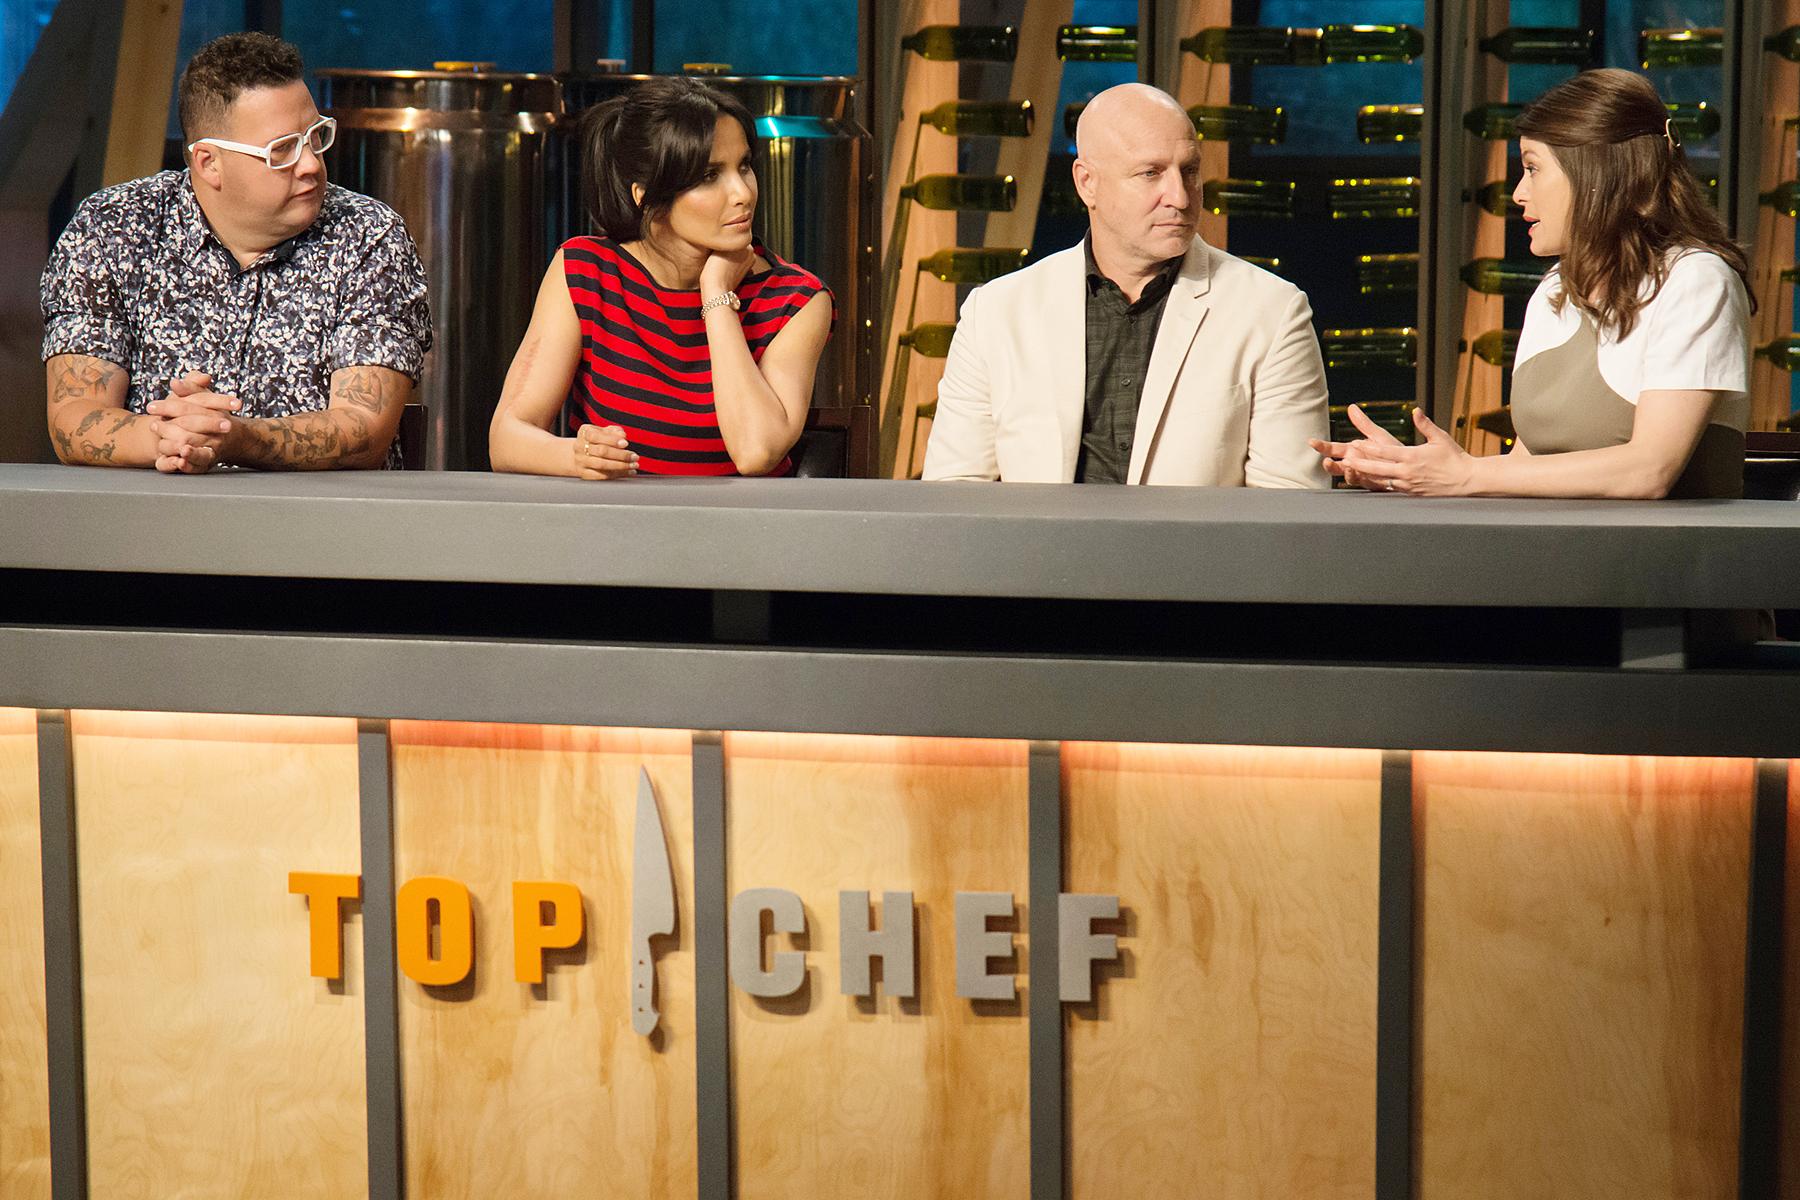 Graham Elliot Padma Lakshmi Tom Colicchio Gail Simmons season 15 Top Chef